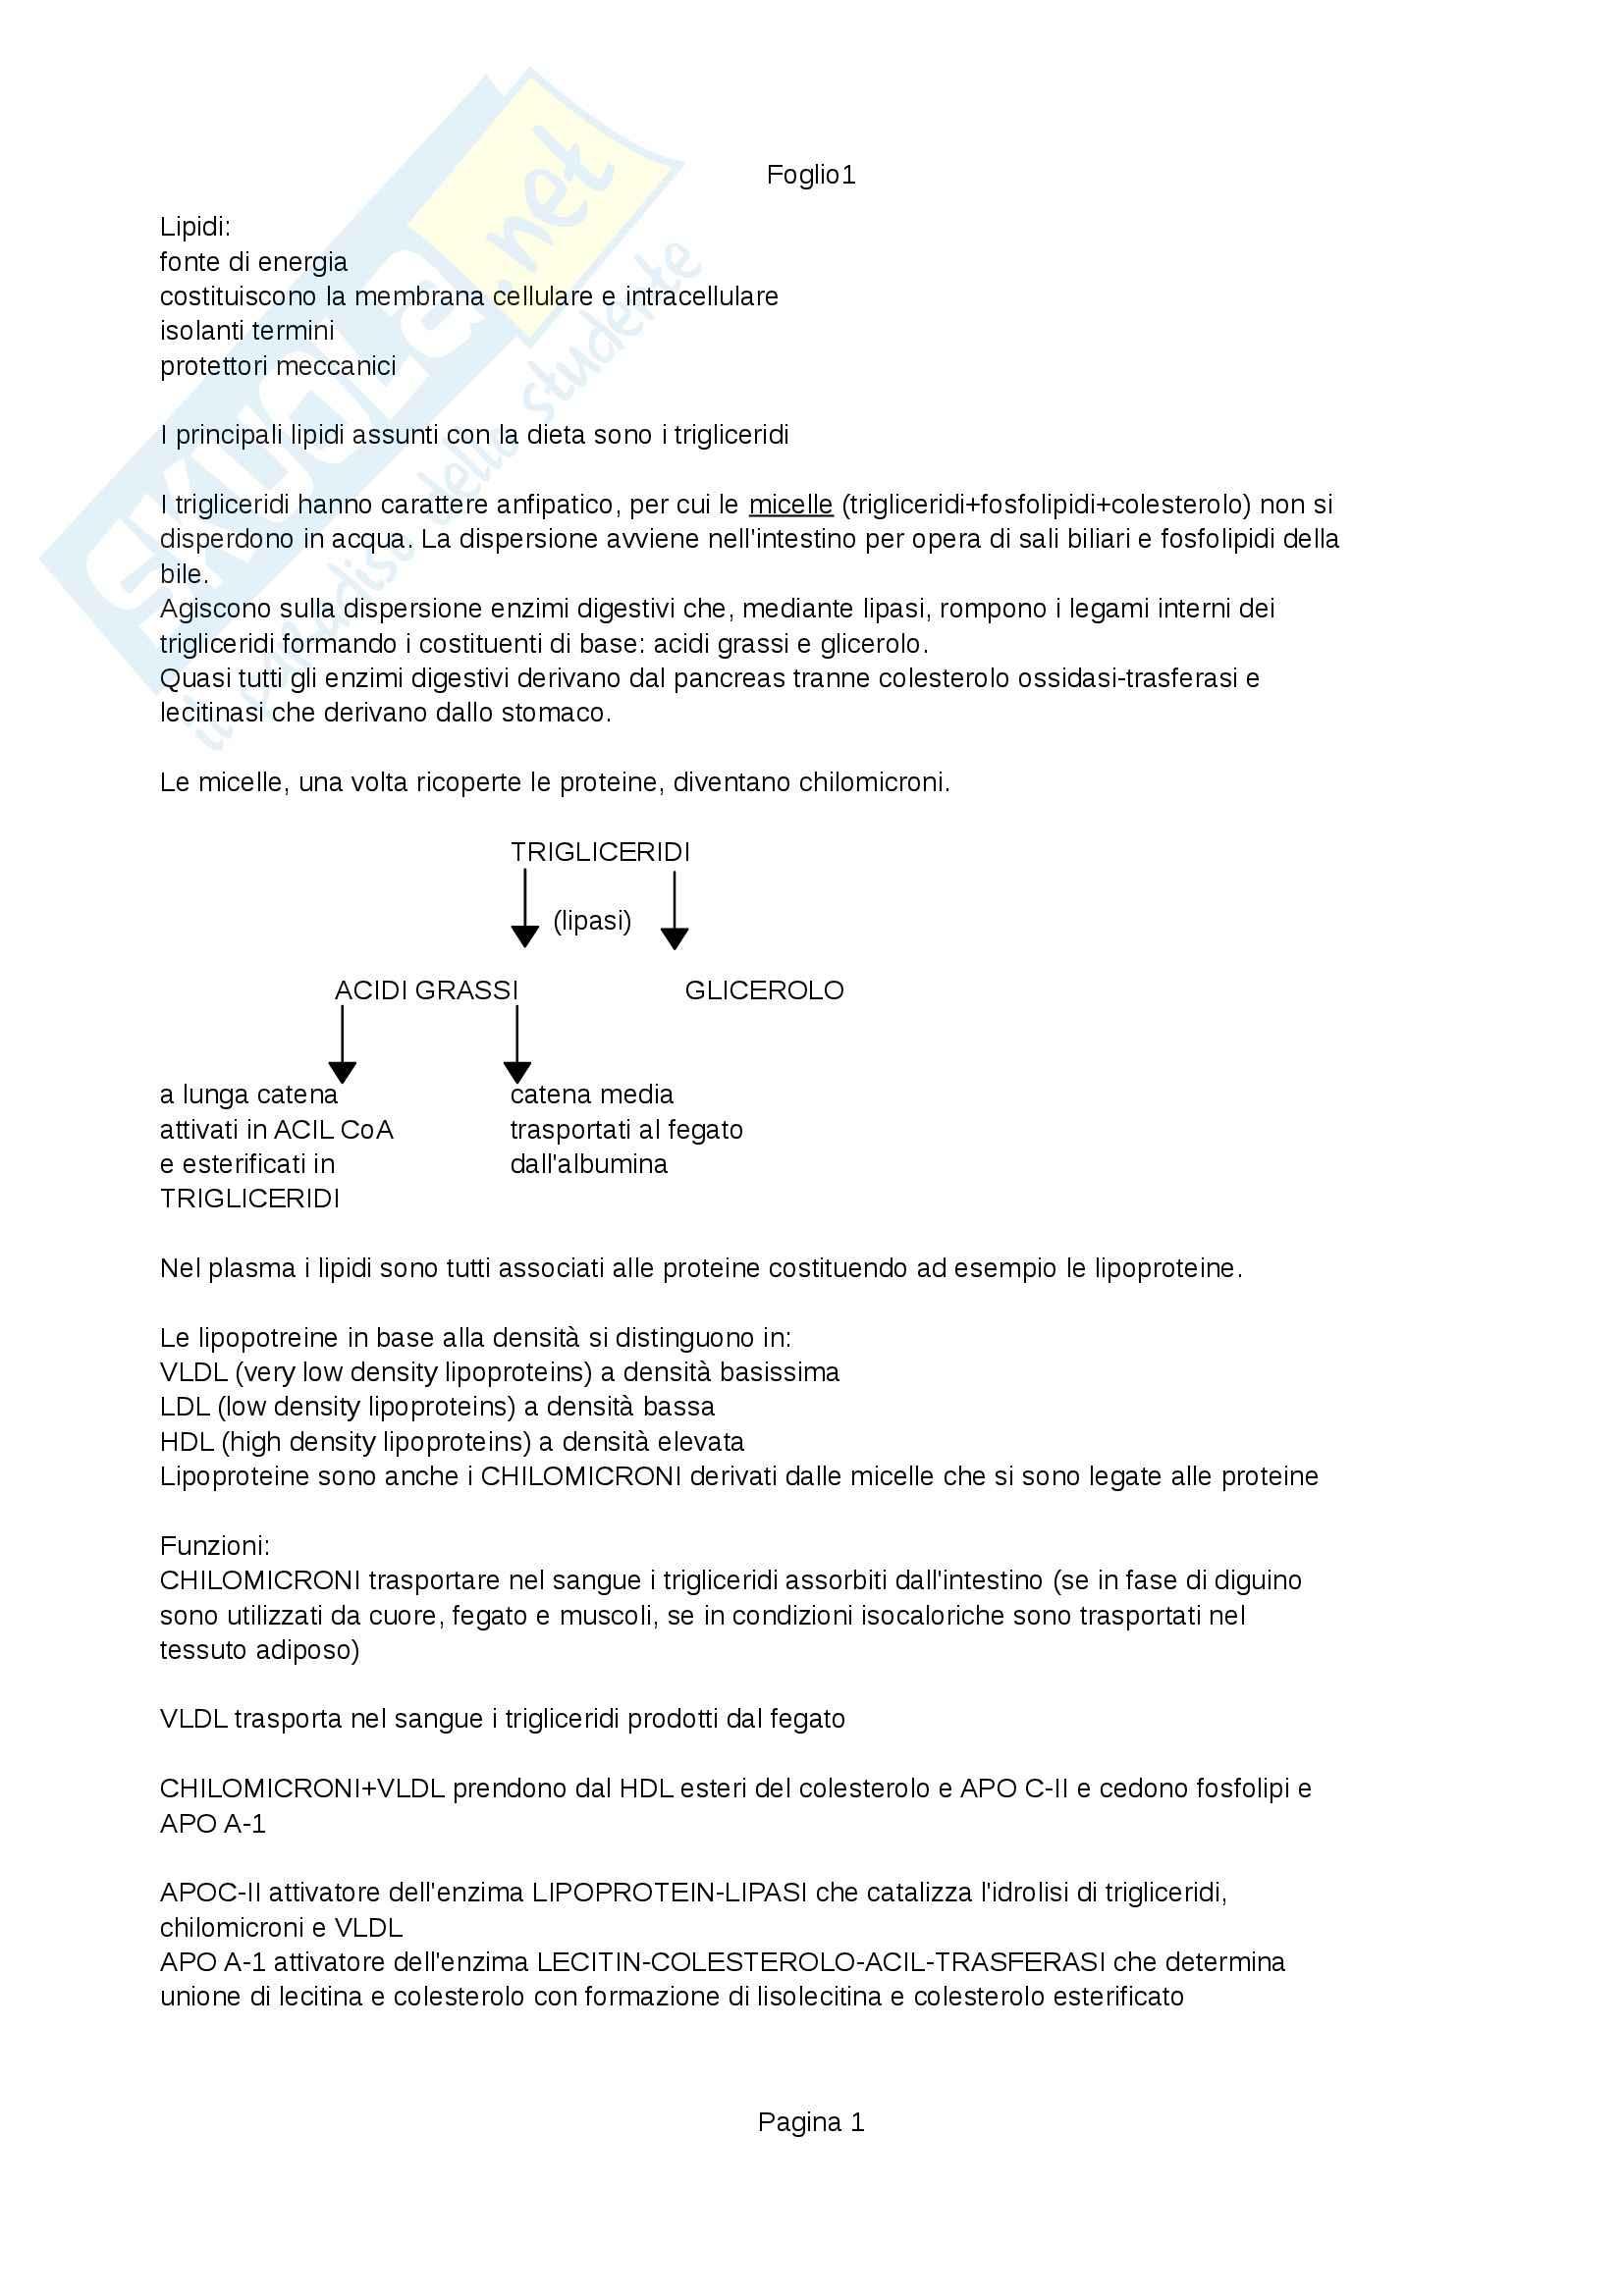 Riassunto esame Biochimica, prof. Visai, libro consigliato Manuale di Chimica-biochimica Medica e Chimica Clinica di Caldera e Burti